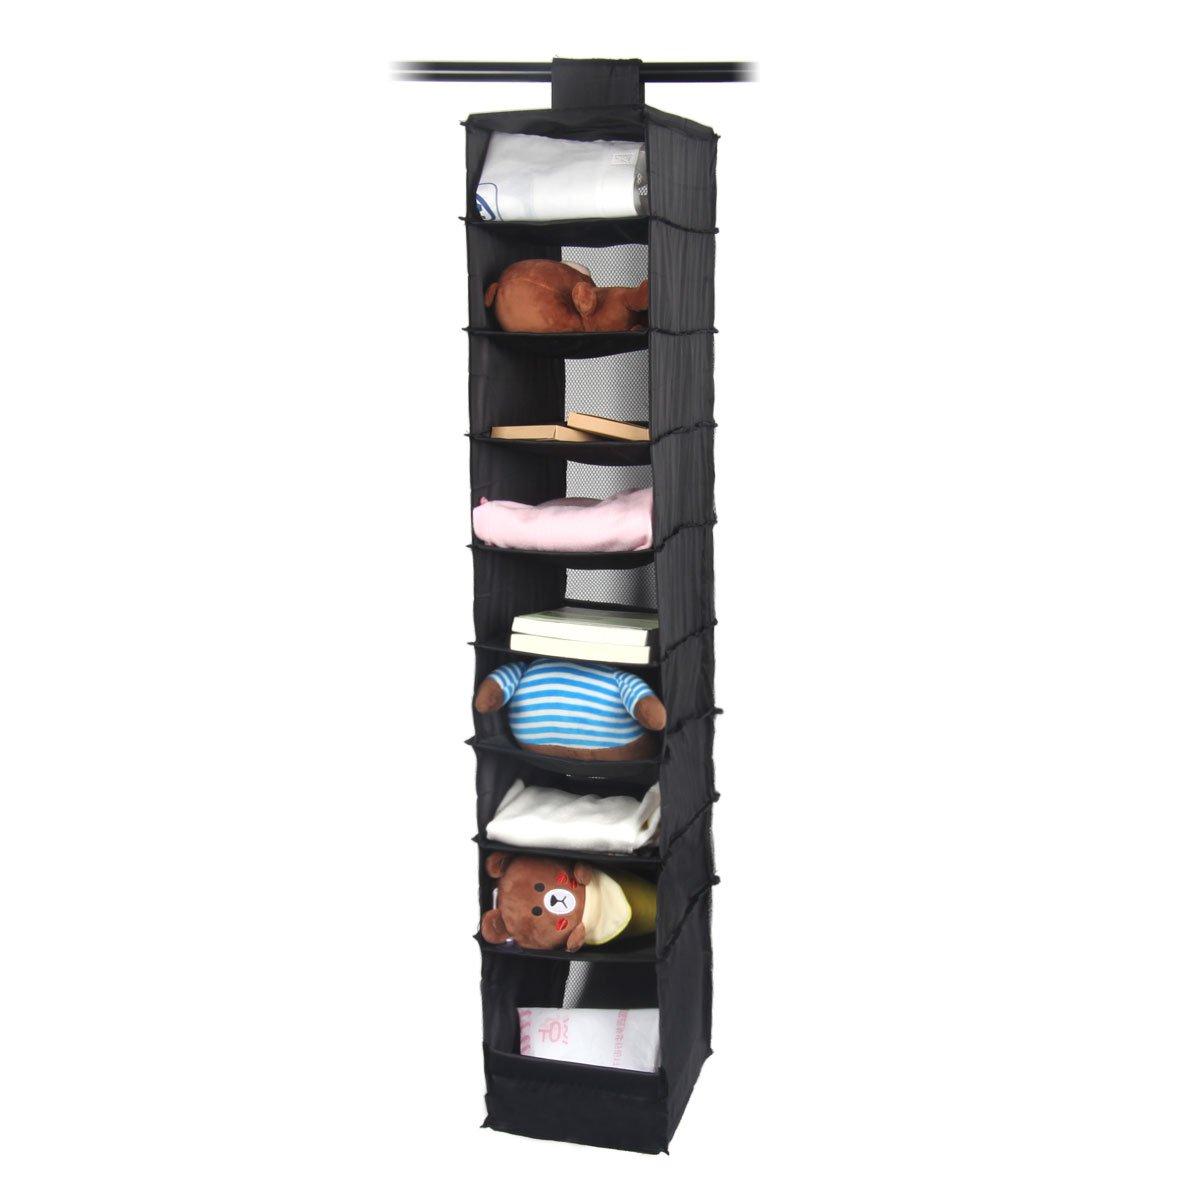 Aobeau 3 Shelf Hanging Closet Organizer With 3 Drawers